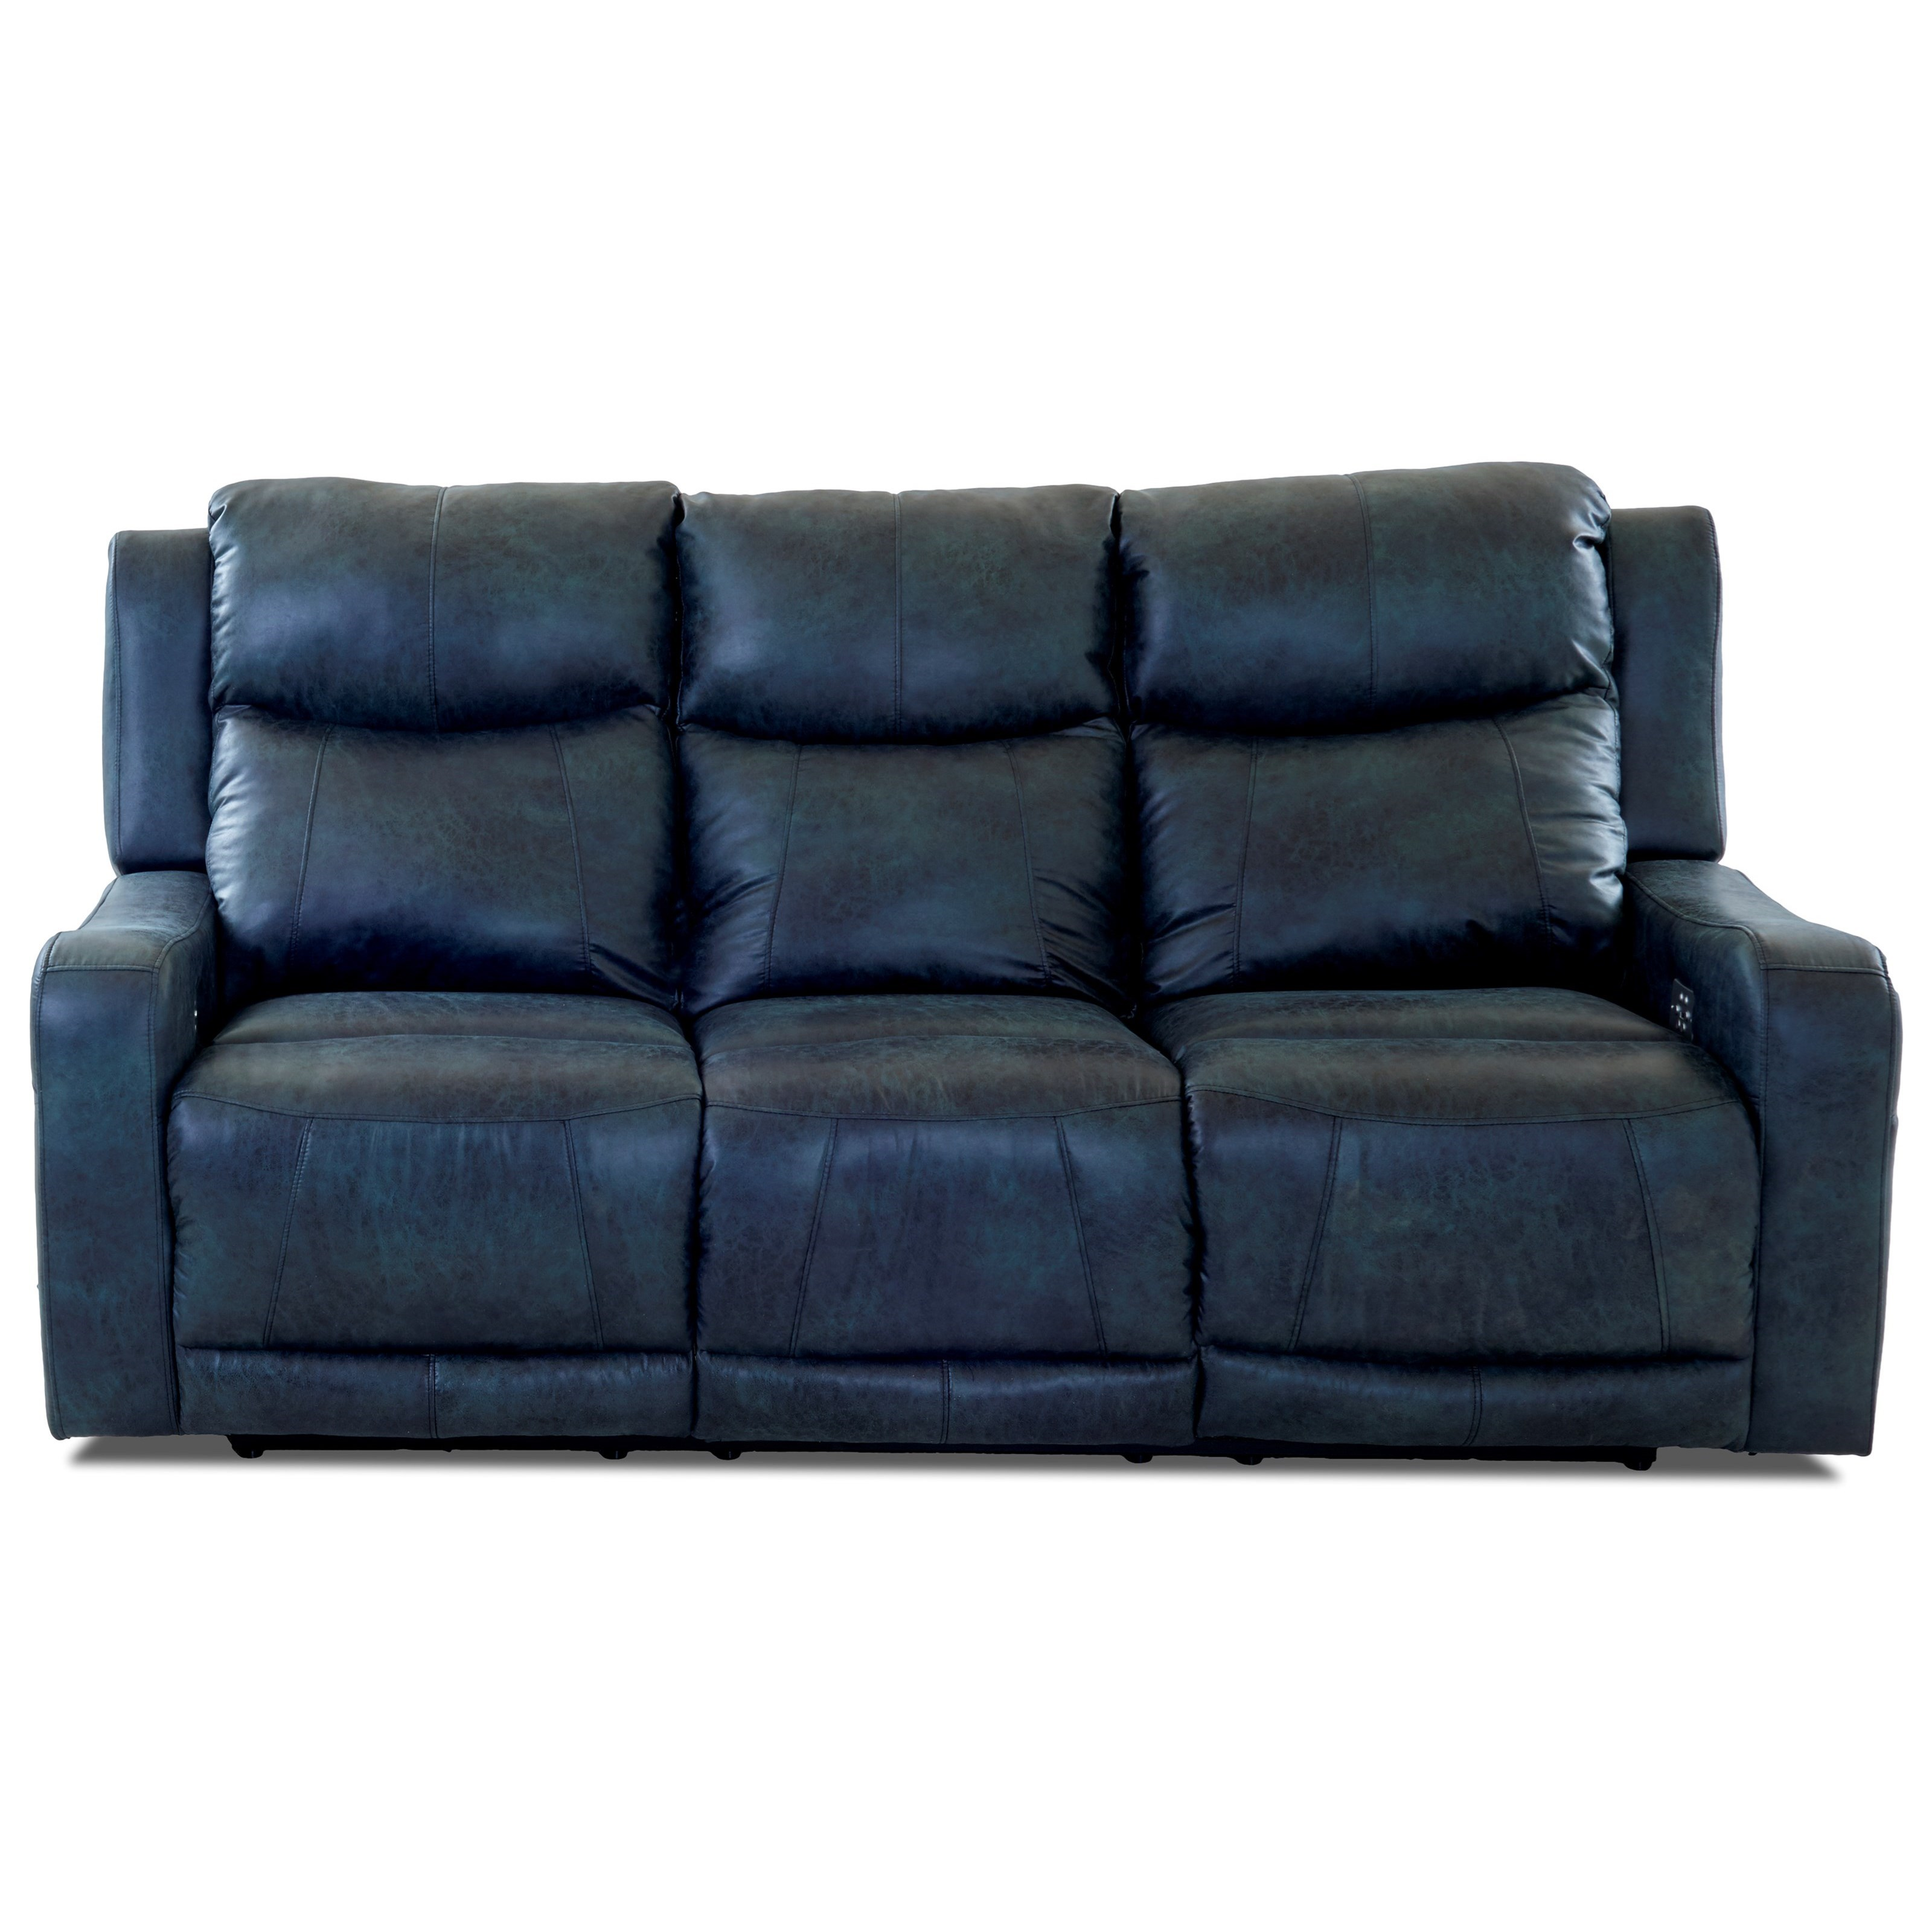 two cushion power reclining sofa light grey uk klaussner barnett with